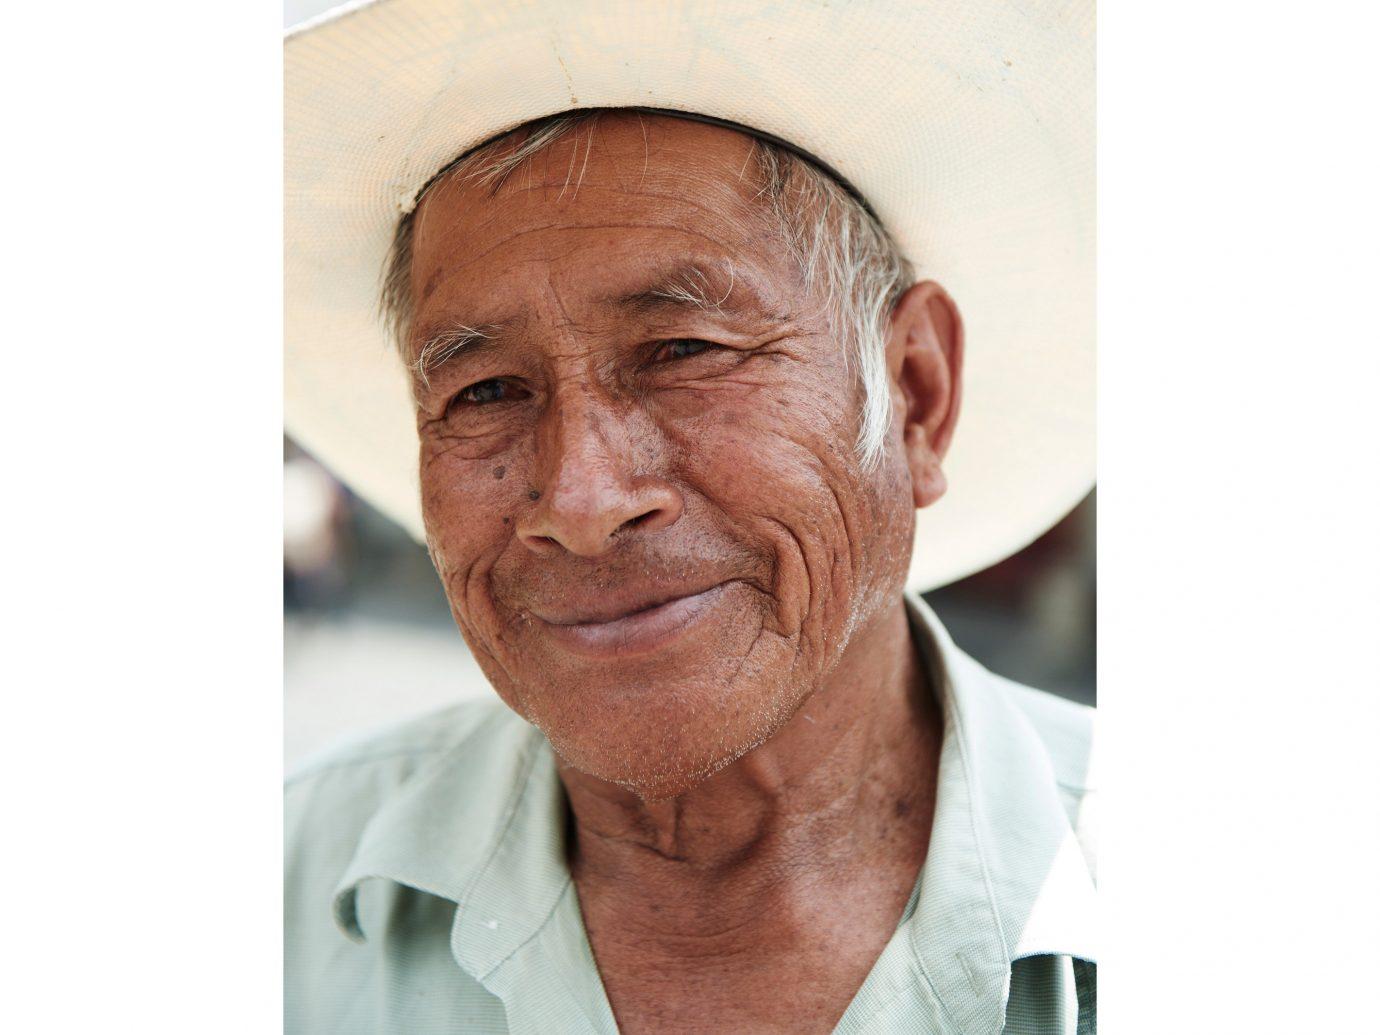 Trip Ideas man person face wearing indoor nose senior citizen head suit profession posing professional speaker older